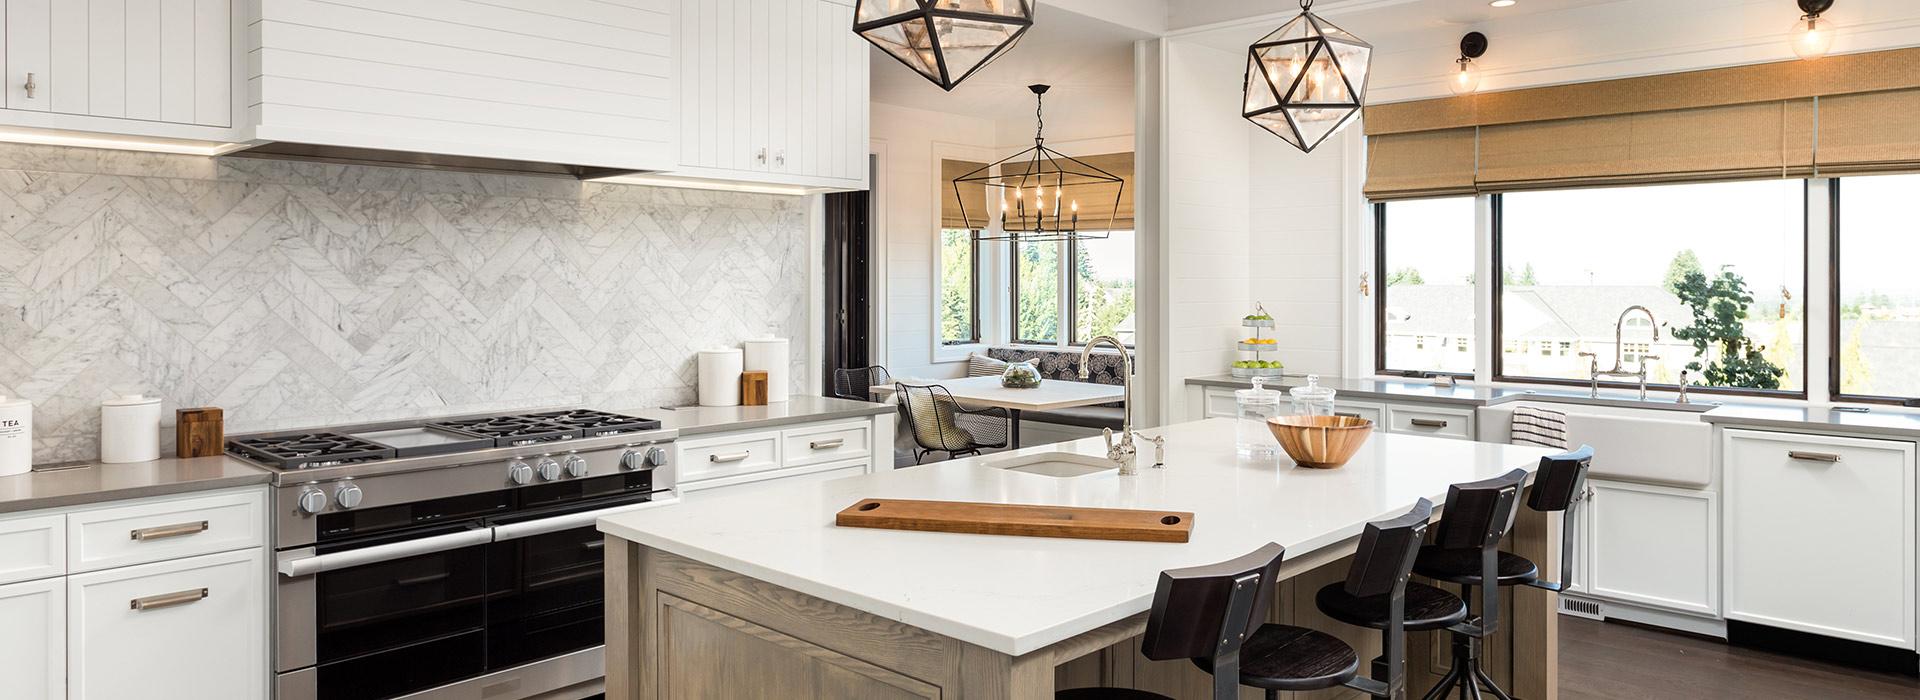 Kitchen Cabinets In Phoenix Az Las Vegas Nv Authentic Custom Cabinetry